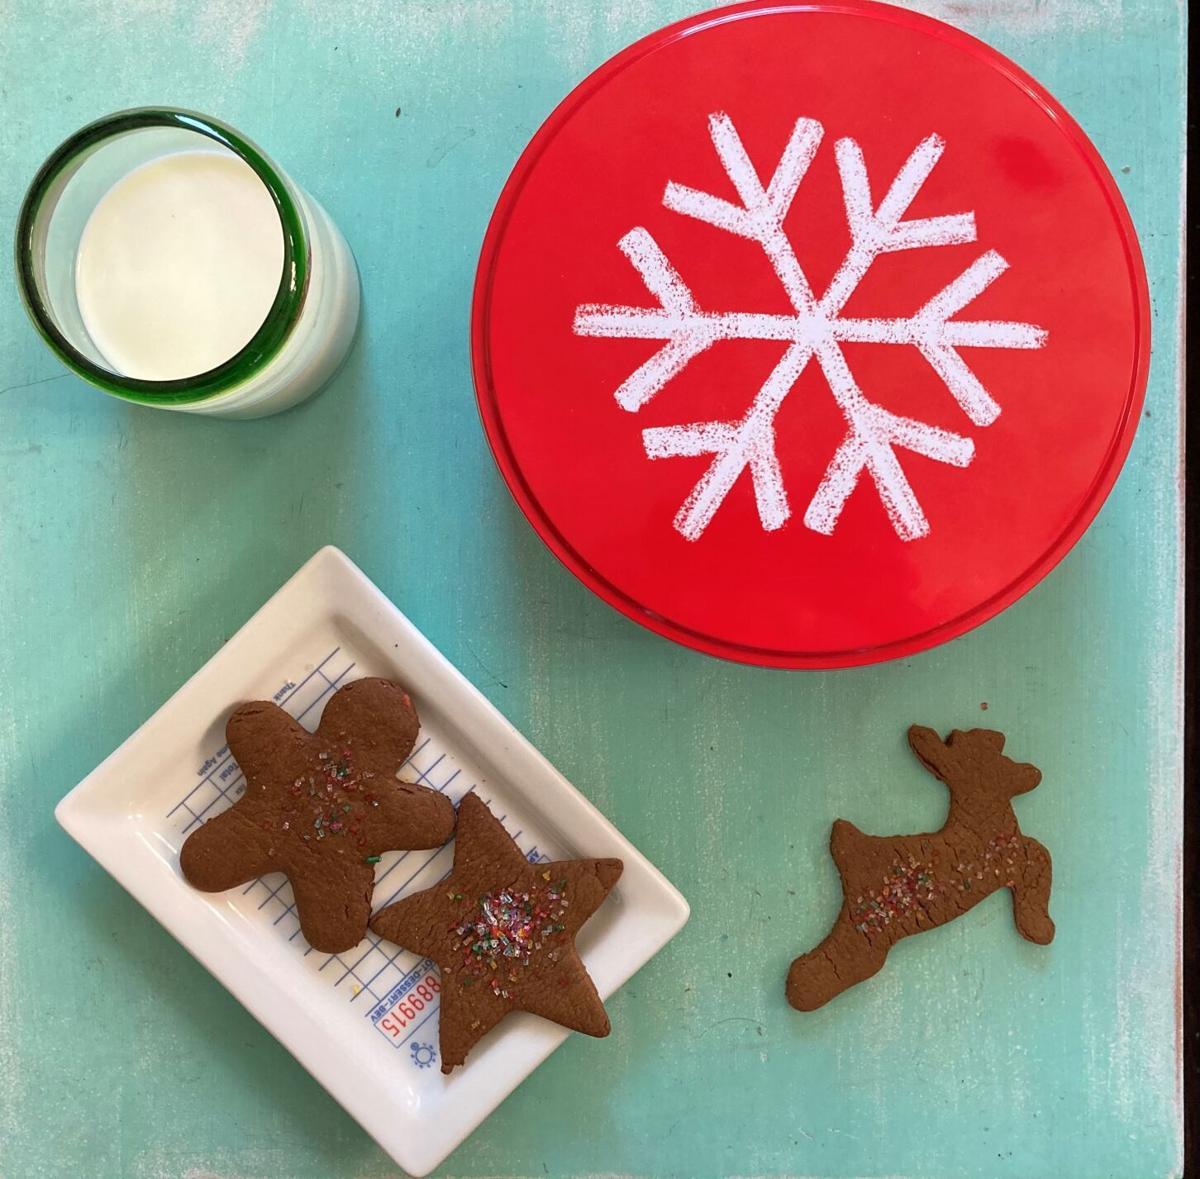 Gingerbread cookies and milk.